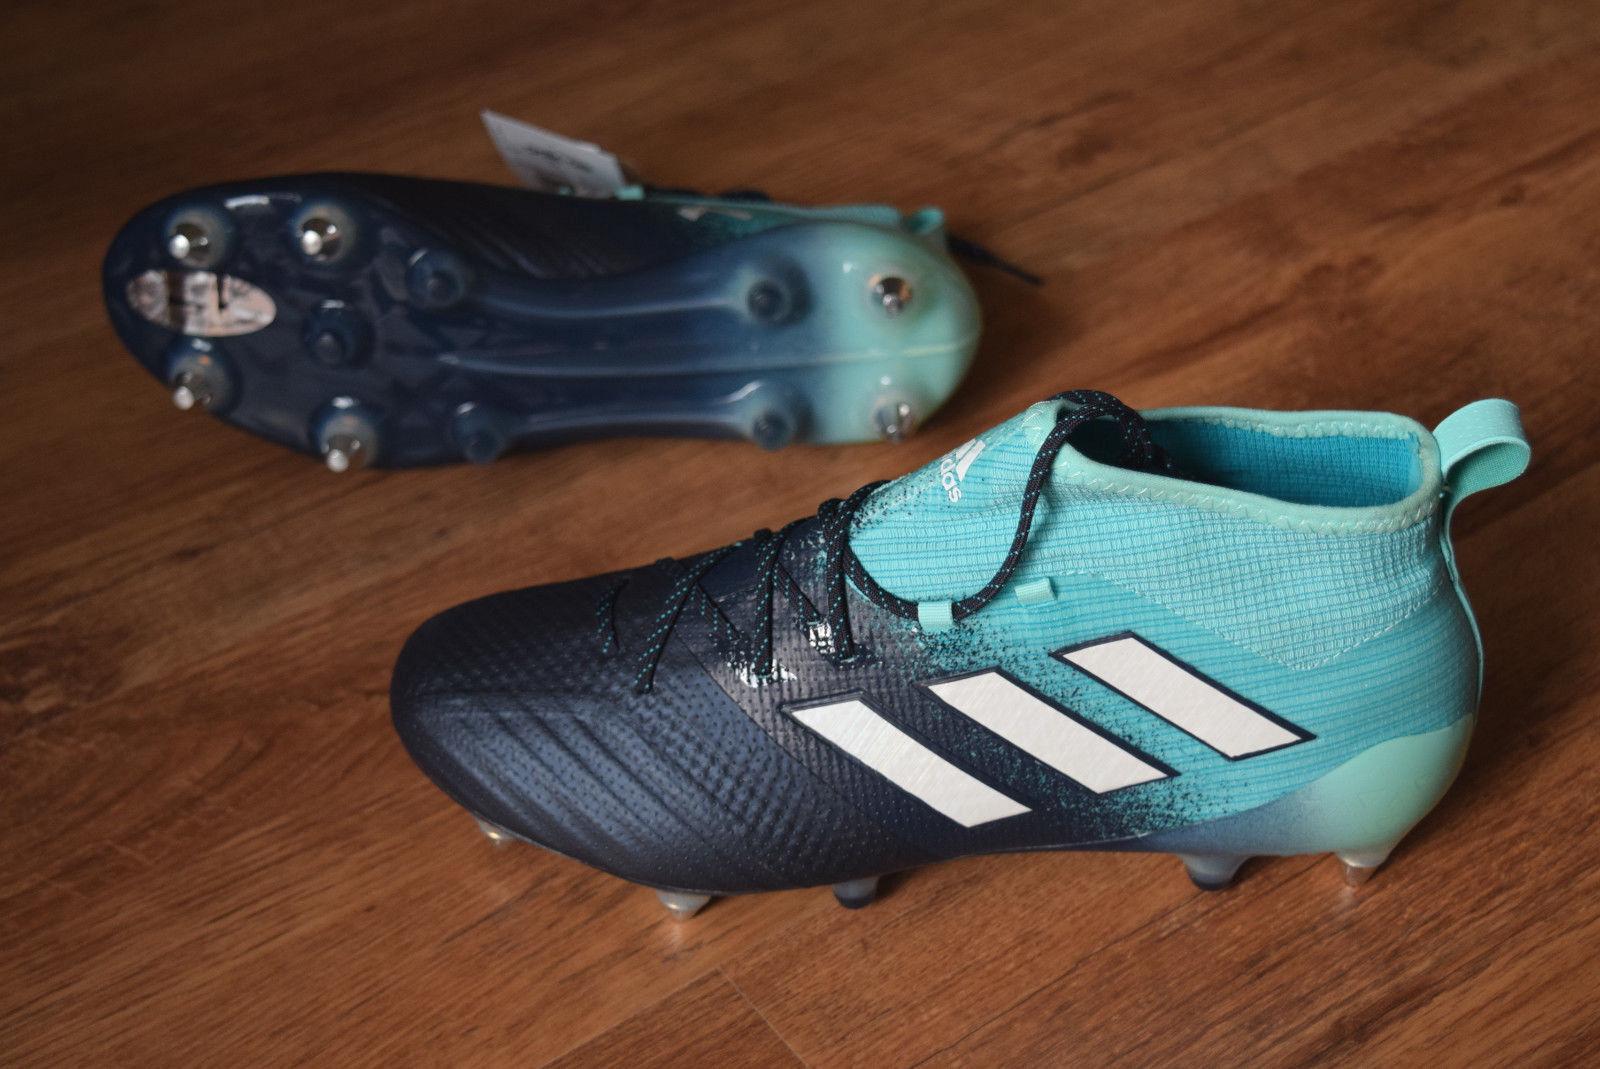 Adidas ace 17.1 sg 40 41 42 42,5 43 s77050 soft ground football bottes